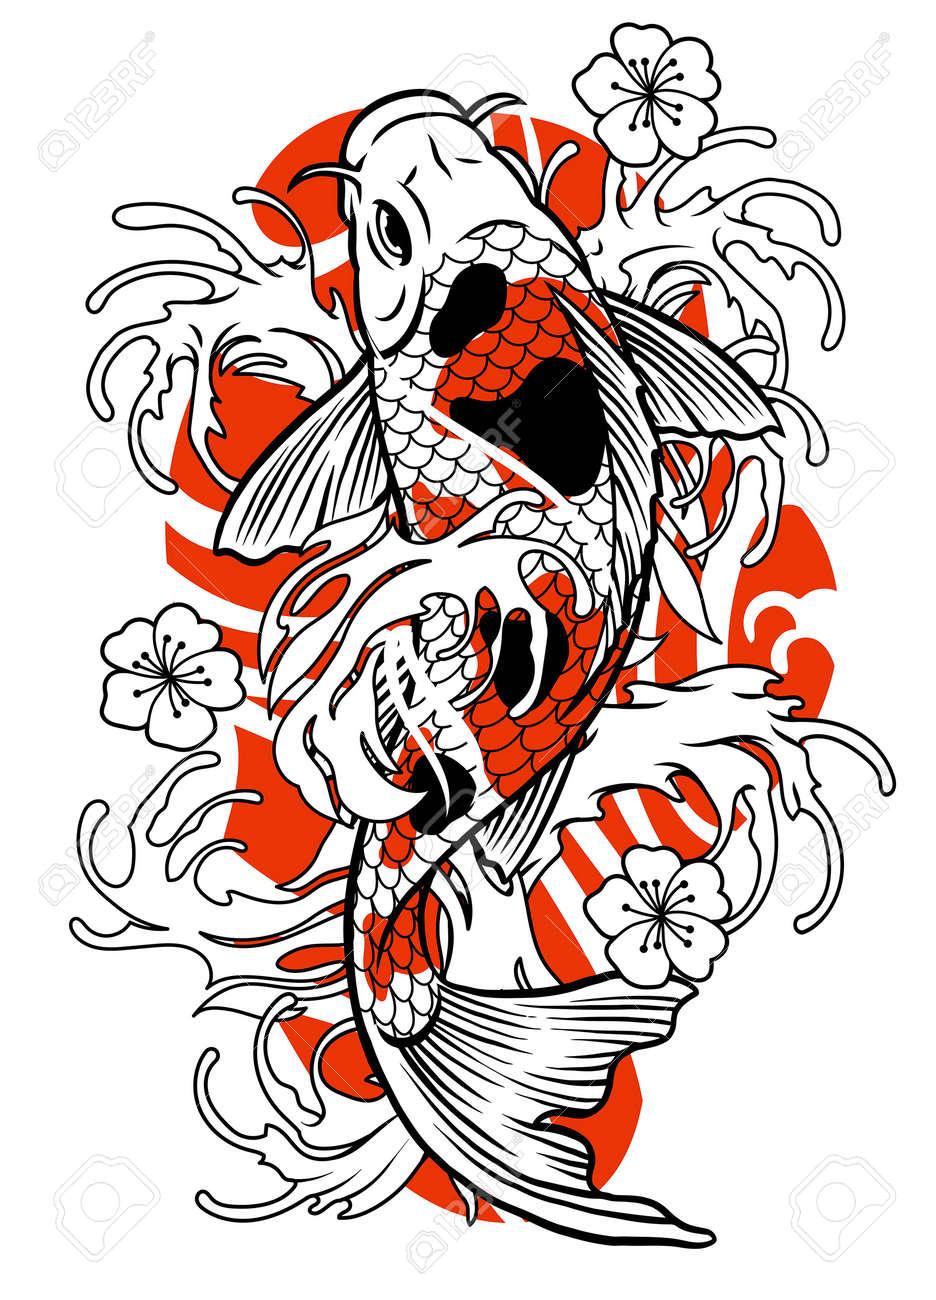 vector of vintage tattoo of koi fish design - 163541158